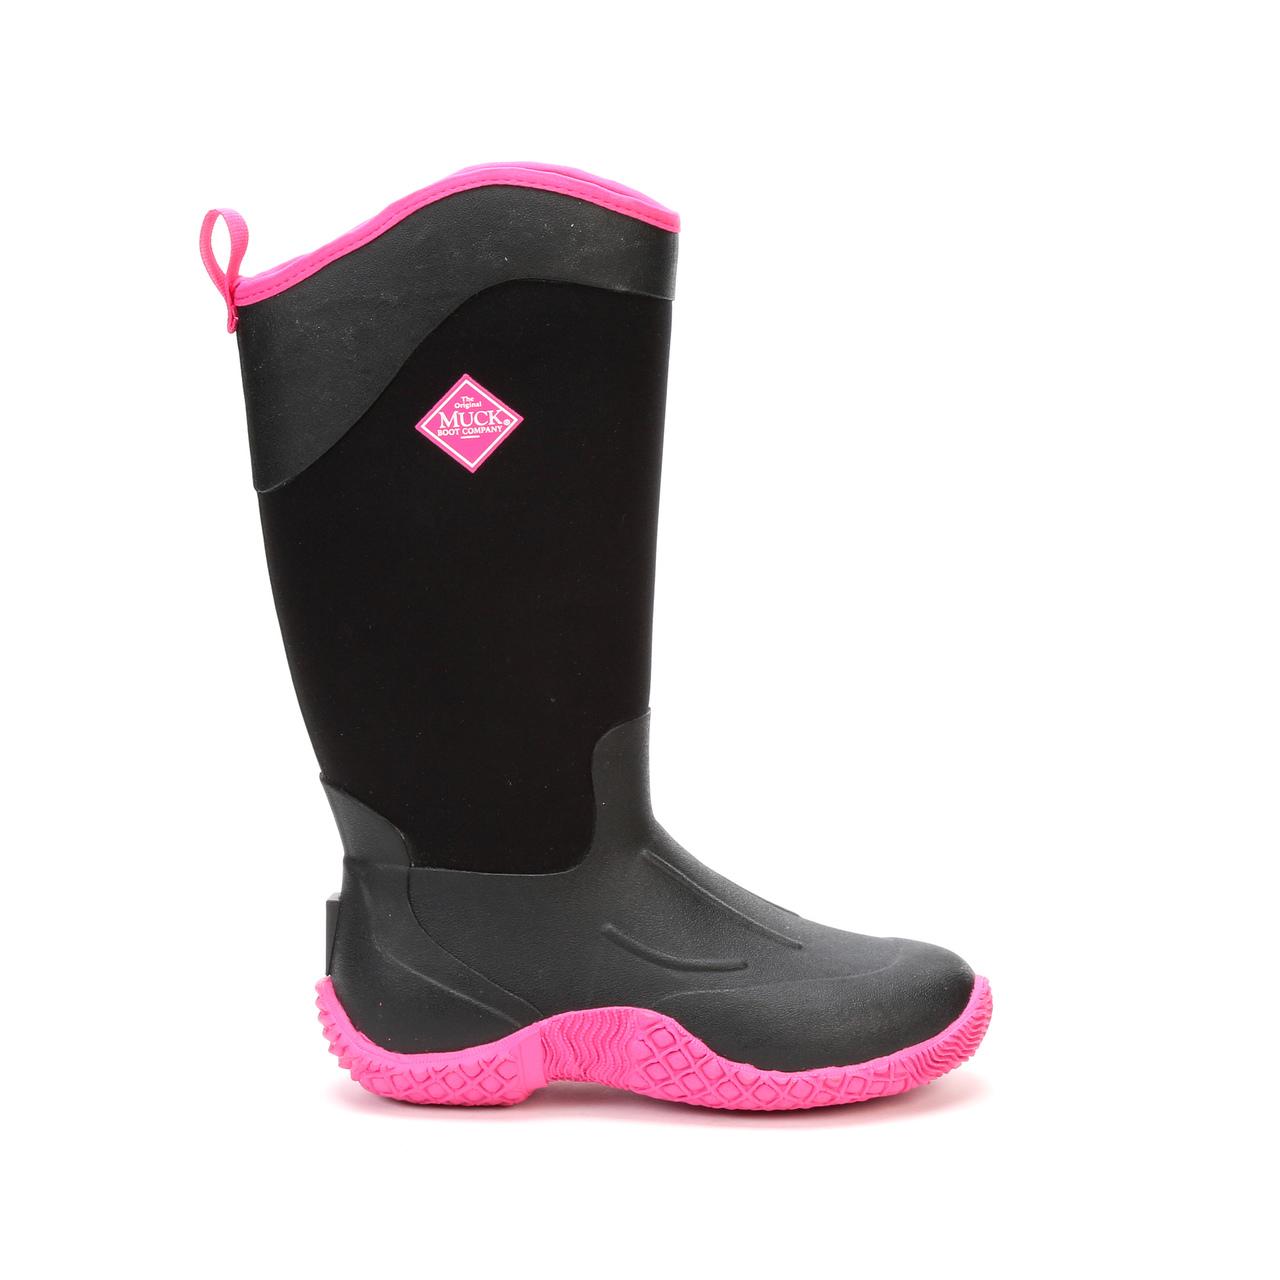 Muck Boots Women's Tack II Hi Equestrian Boot-Black/Hot Pink   eBay